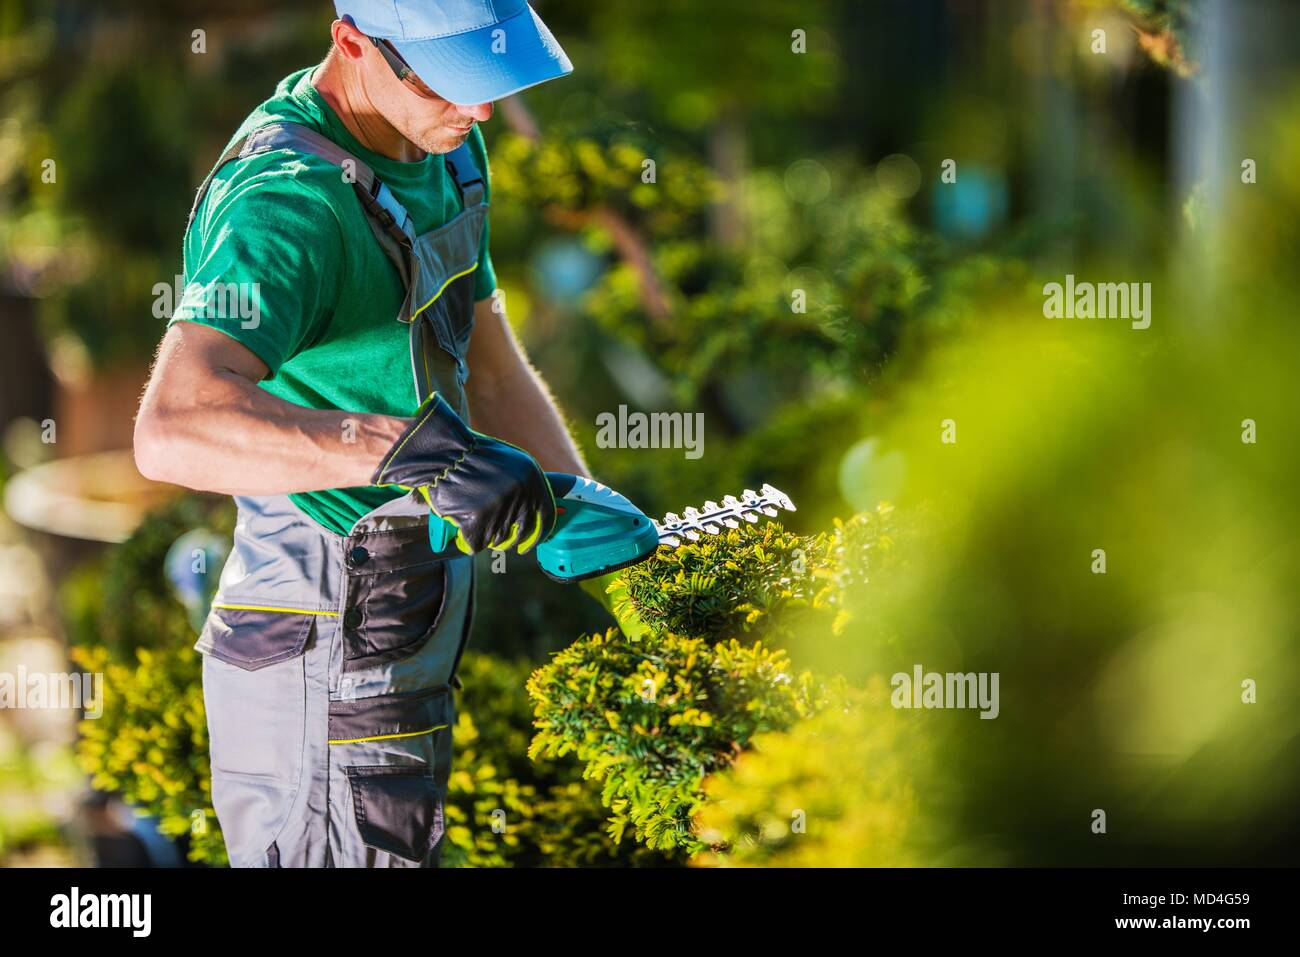 Spring Time Plants Trimming Work. Caucasian Gardener in the Garden. - Stock Image